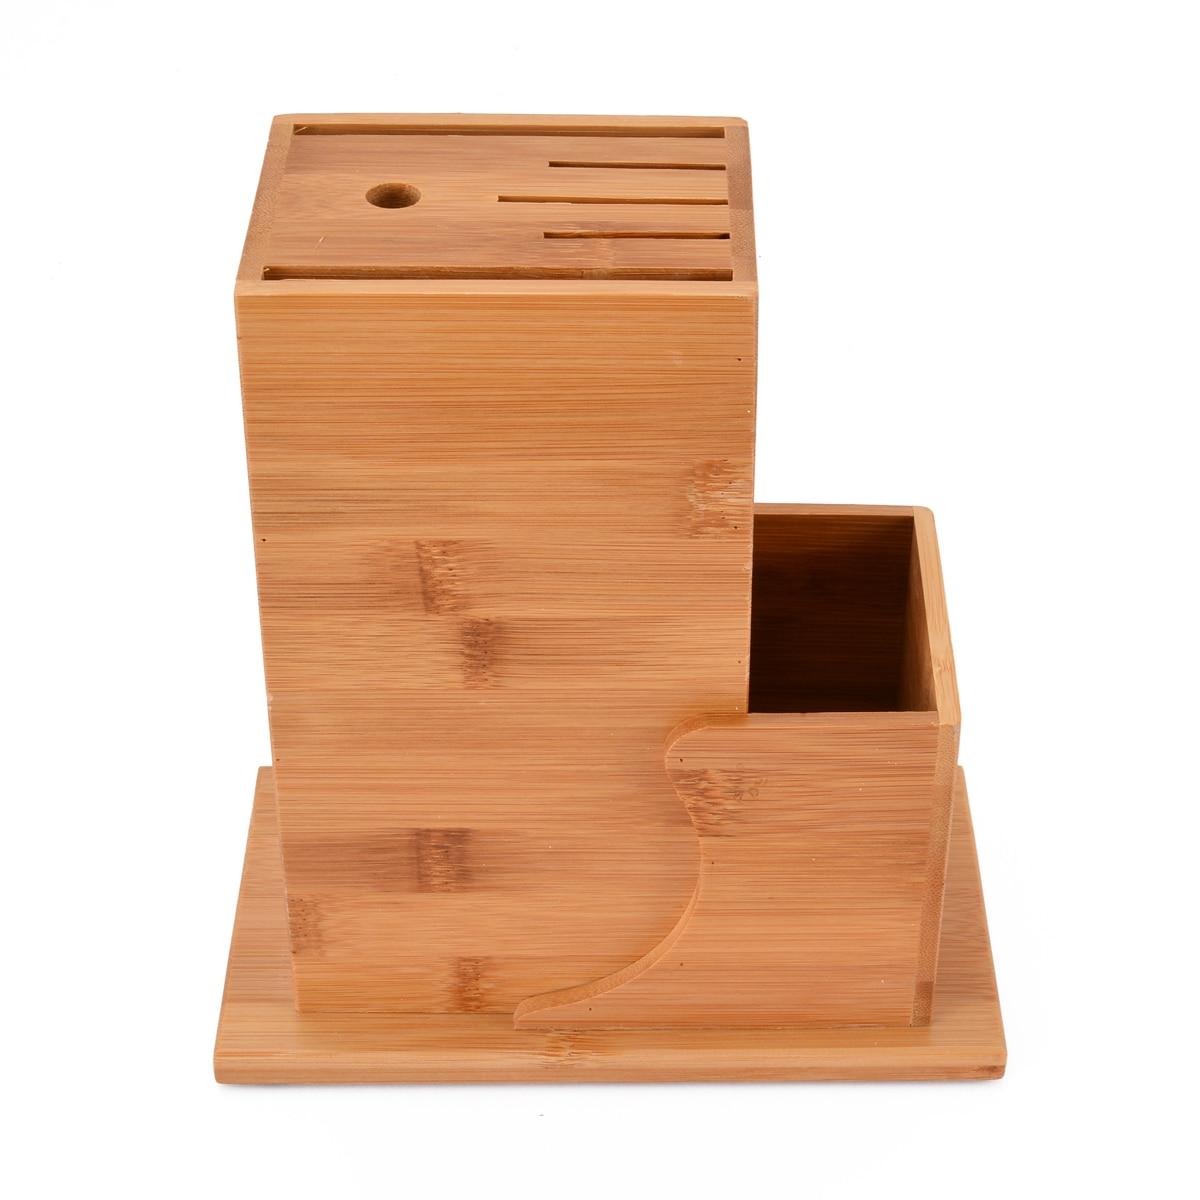 Mayitr Knives Holder Wood Bamboo Kitchen Utensil Holder Block Storage Rack For Home Kitchen Tools Organizer